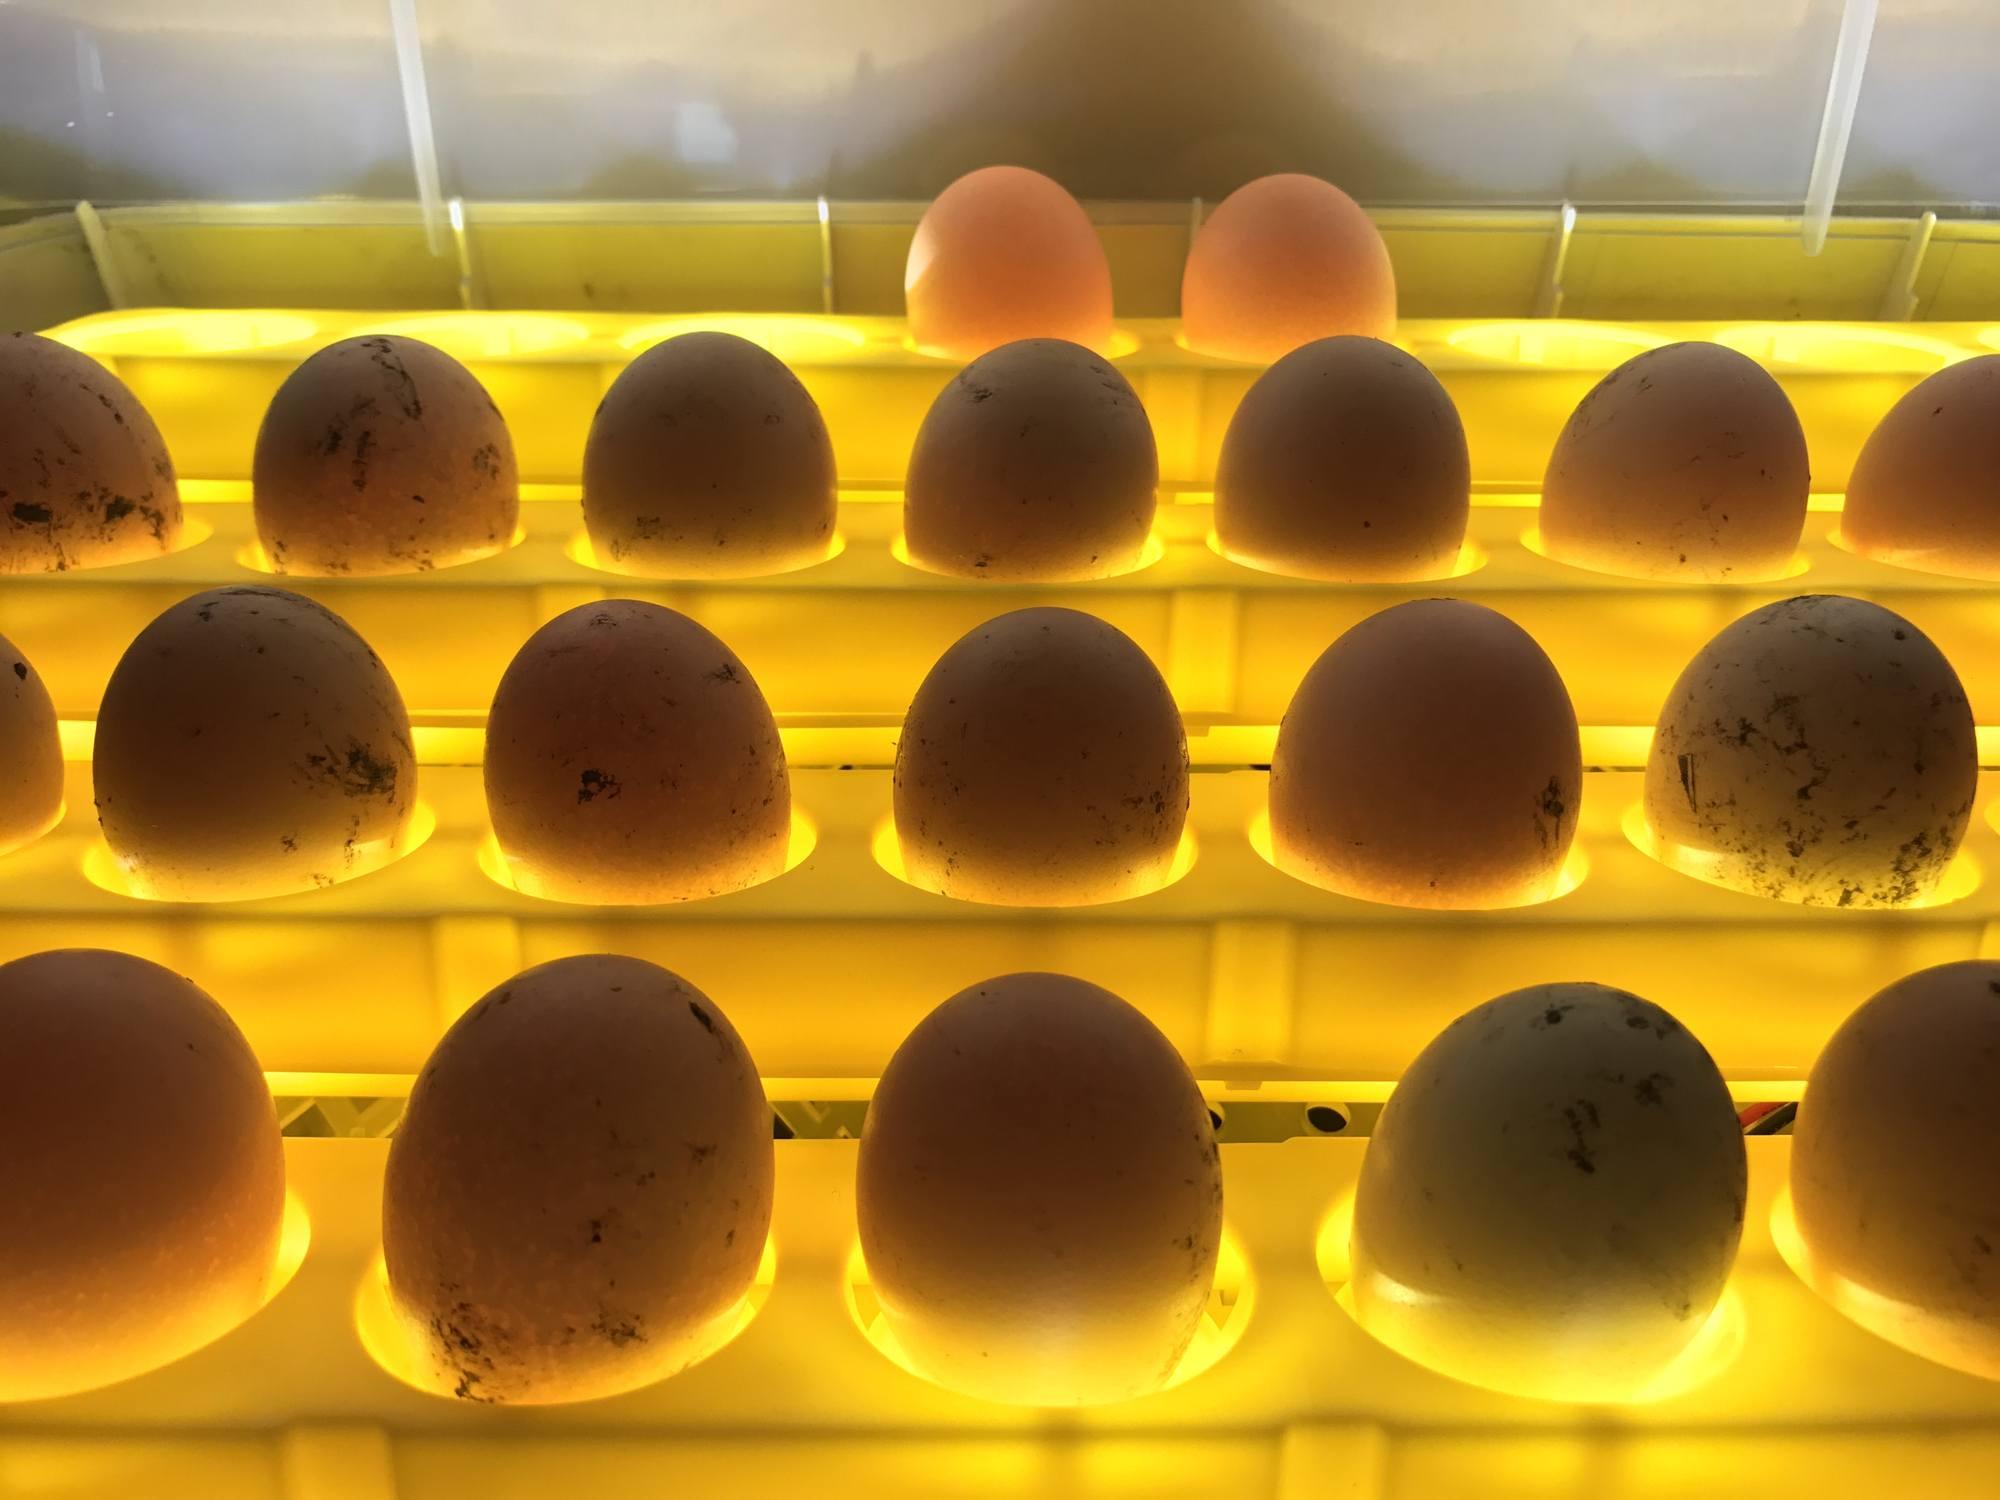 Fresh eggs in incubator